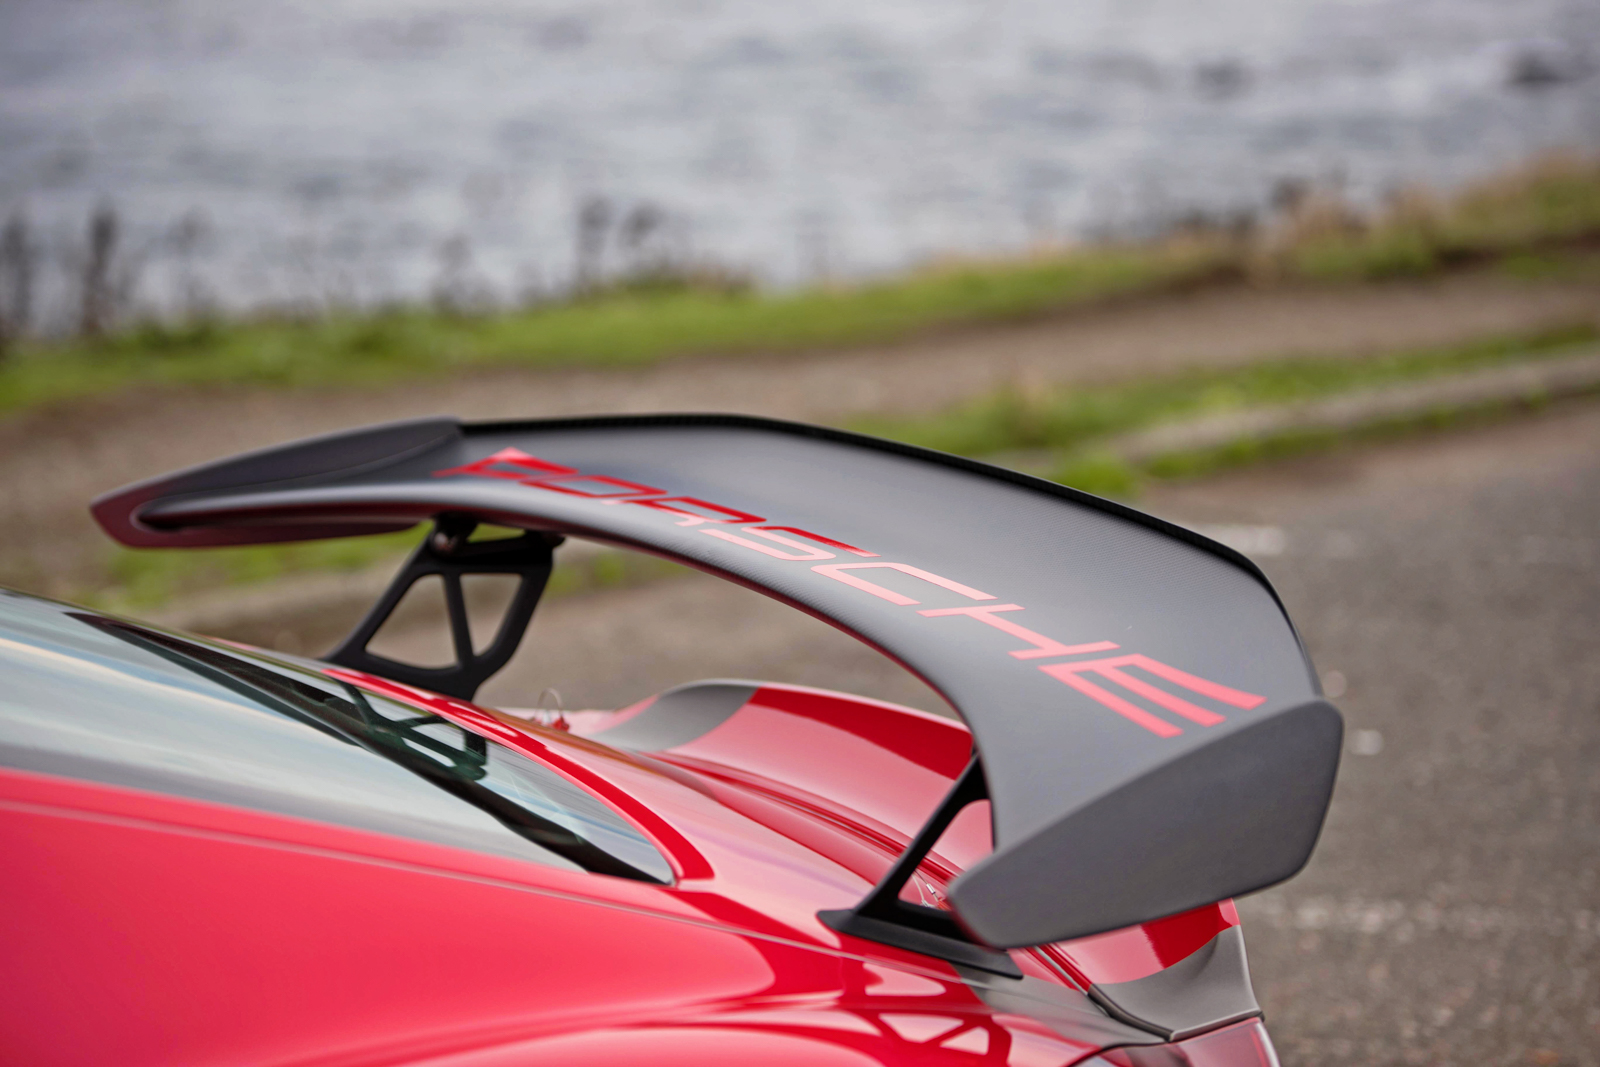 Gt4 Clubsport For Sale >> 2016 Porsche Cayman GT4 CLUBSPORT For Sale   Silver Arrow Cars Ltd